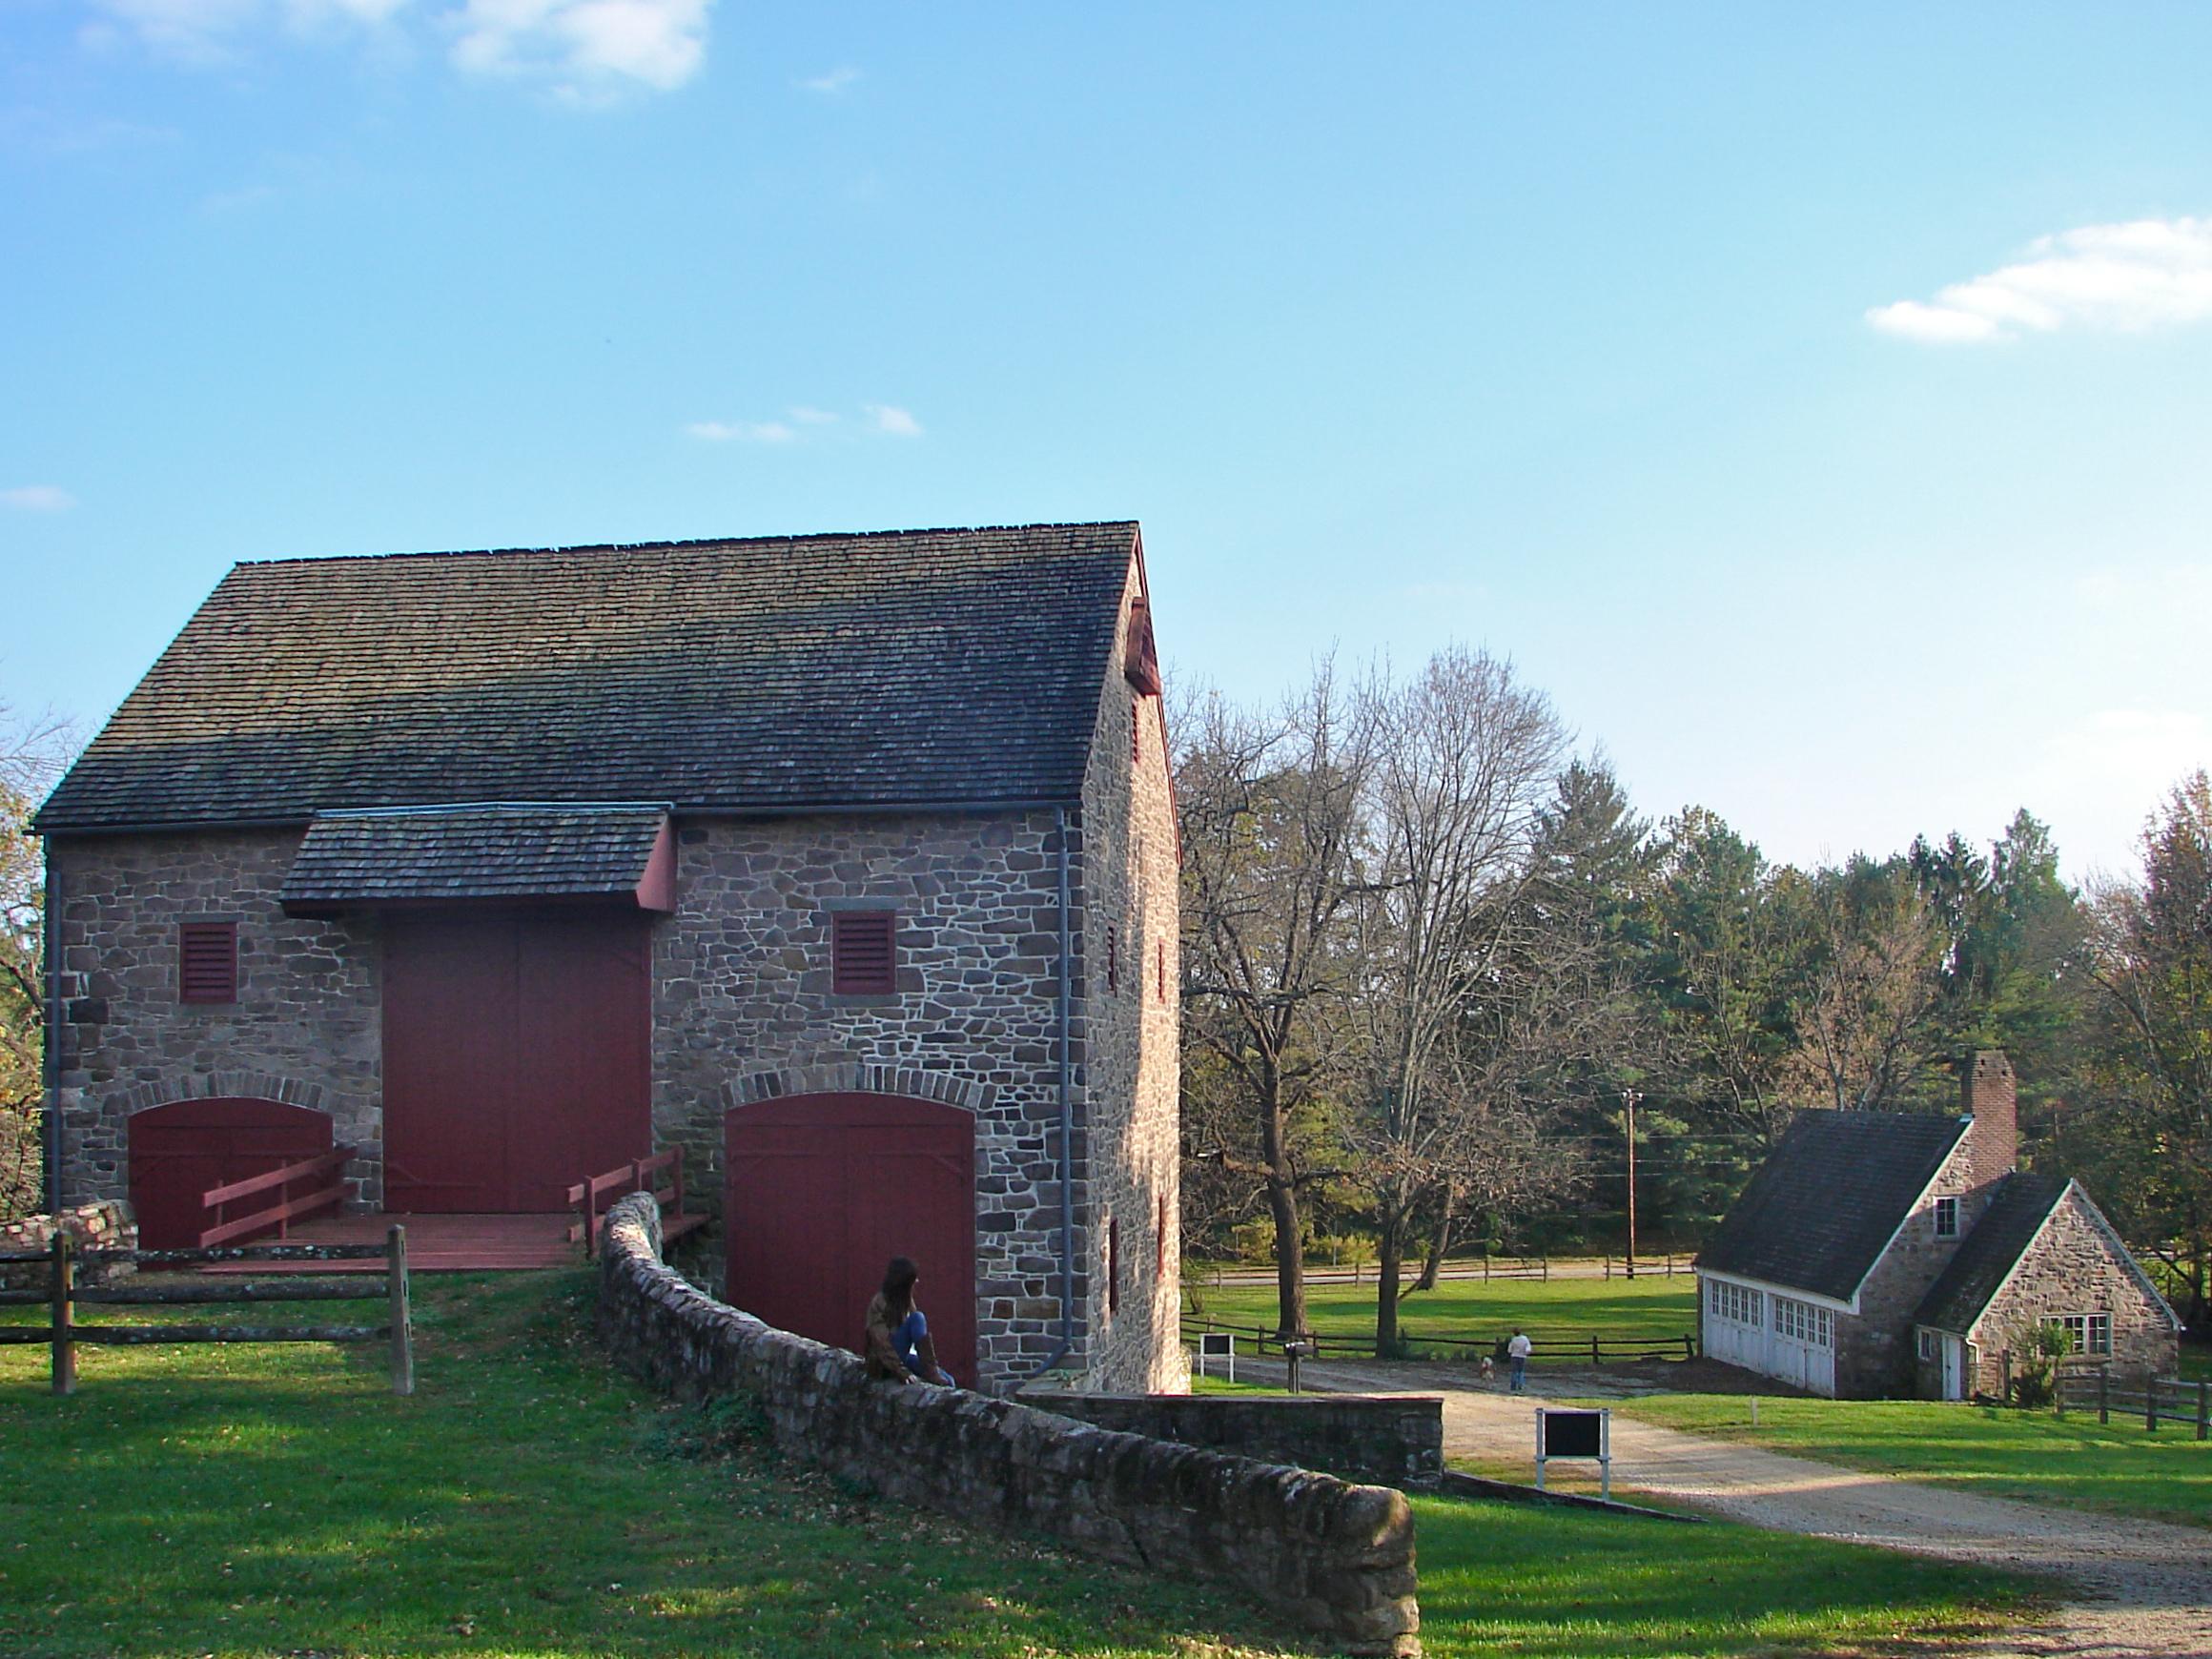 The Highlands' barn.